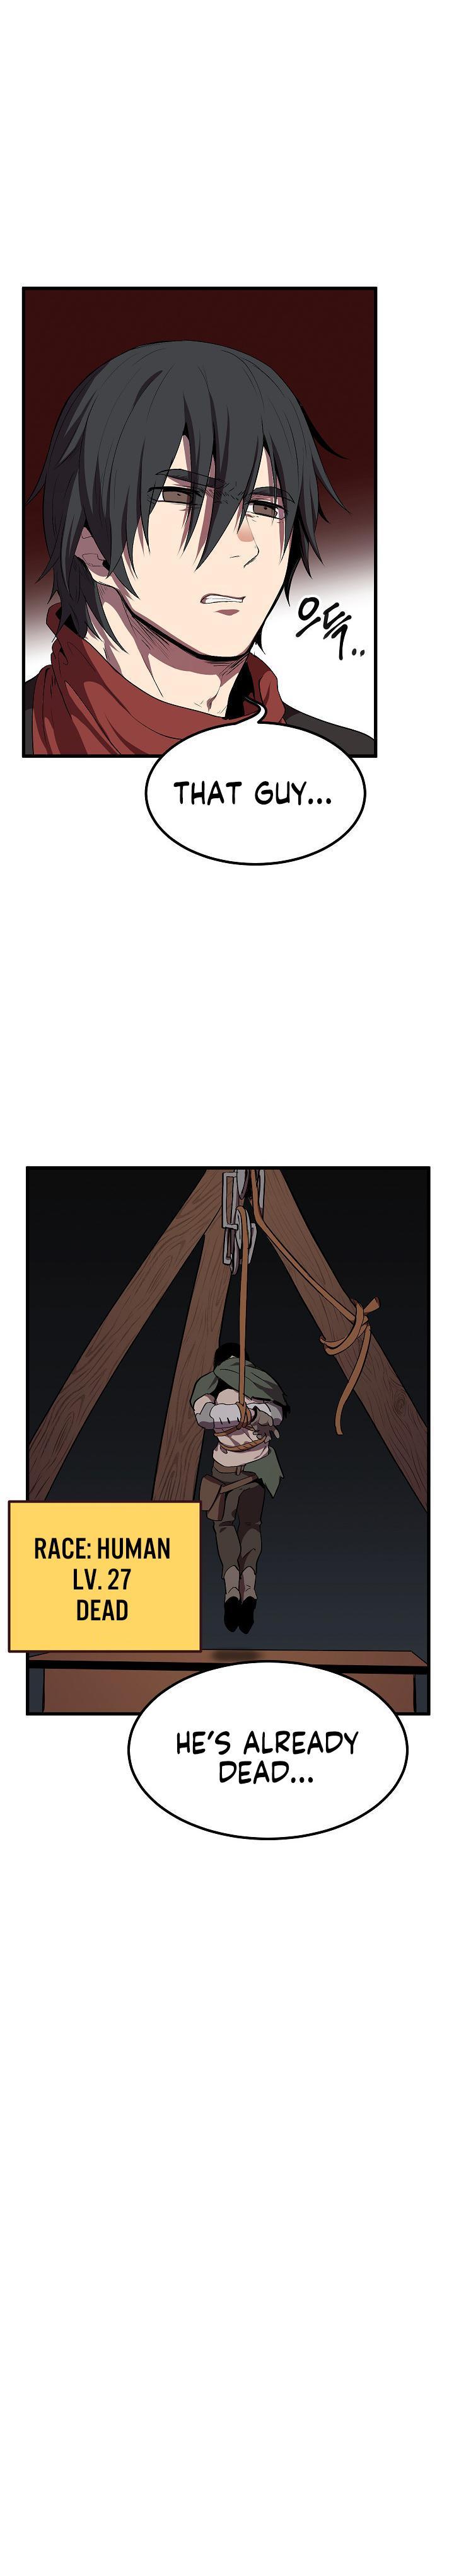 Survival Story Of A Sword King In A Fantasy World Vol.1 Chapter 16 page 17 - Mangakakalots.com